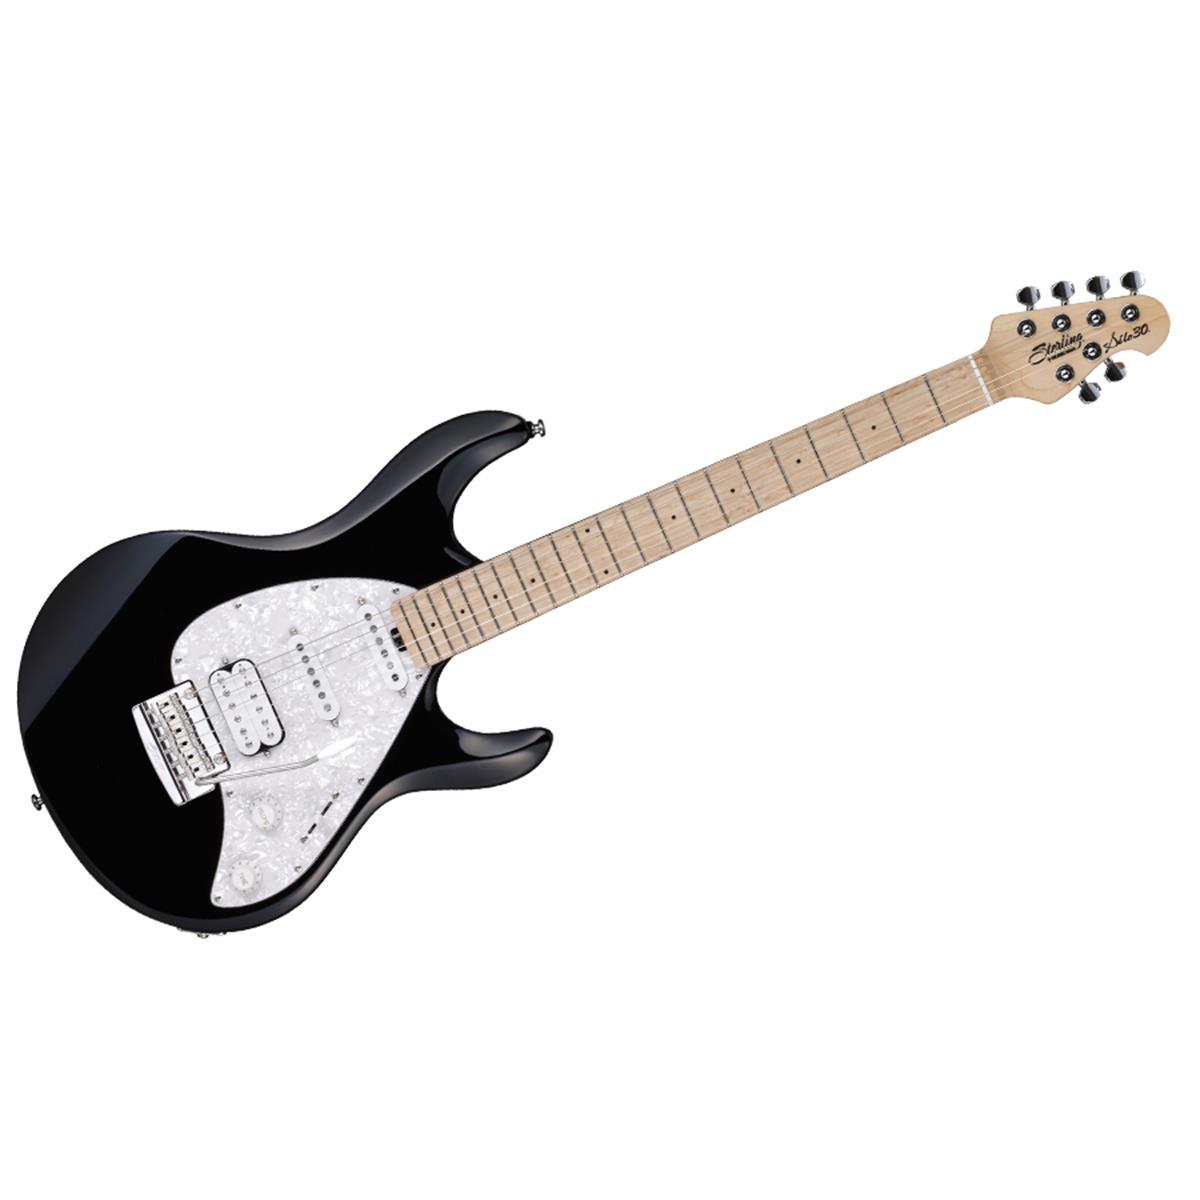 STERLING BY MUSICMAN Silo 30 D-BK - black - c/borsa